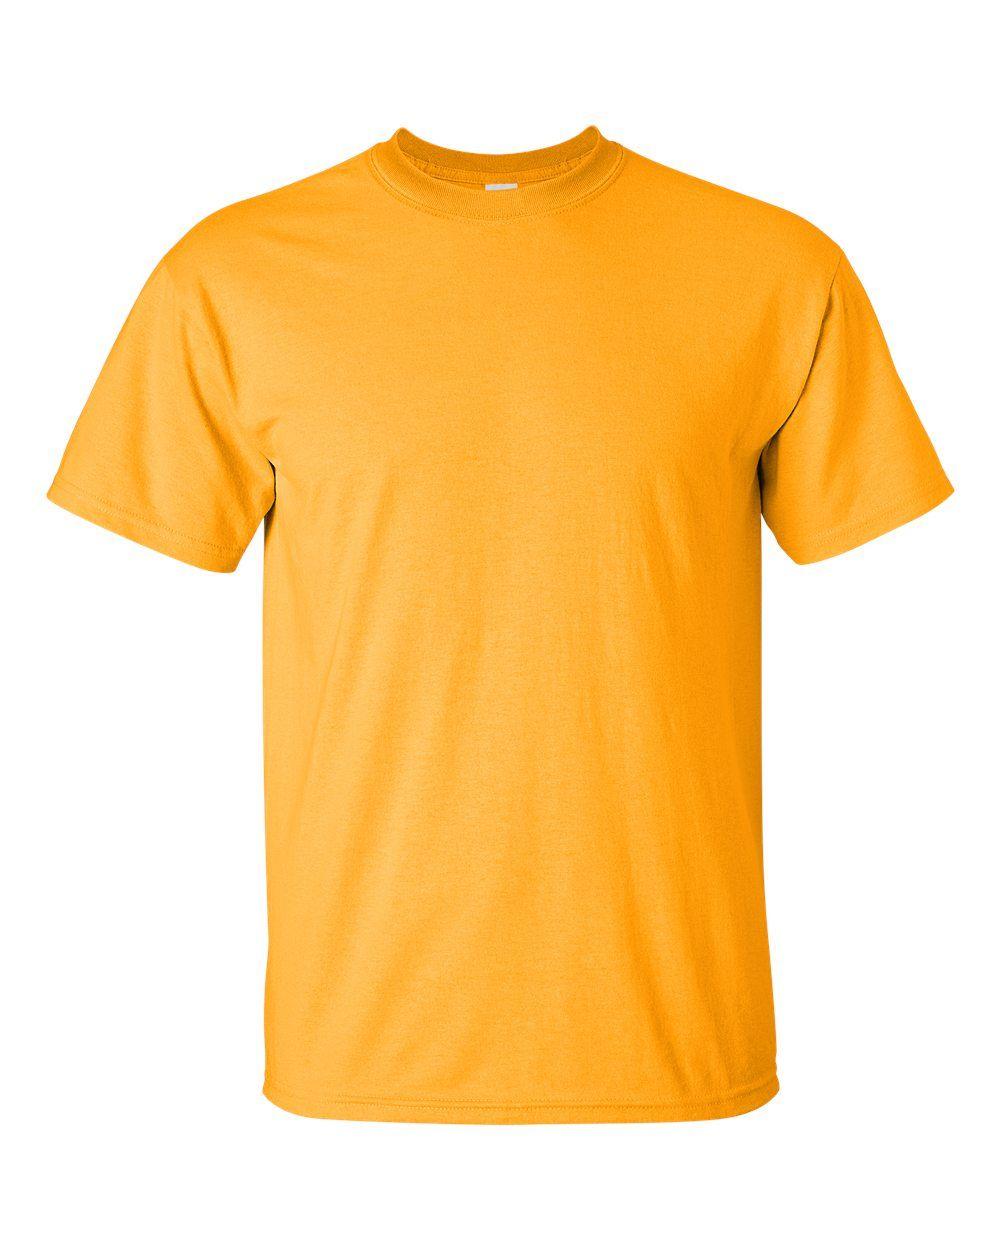 Download Gildan Ultra Cotton T Shirt 2000 Gold Medium In 2021 Wholesale Shirts T Shirt Cotton Tshirt